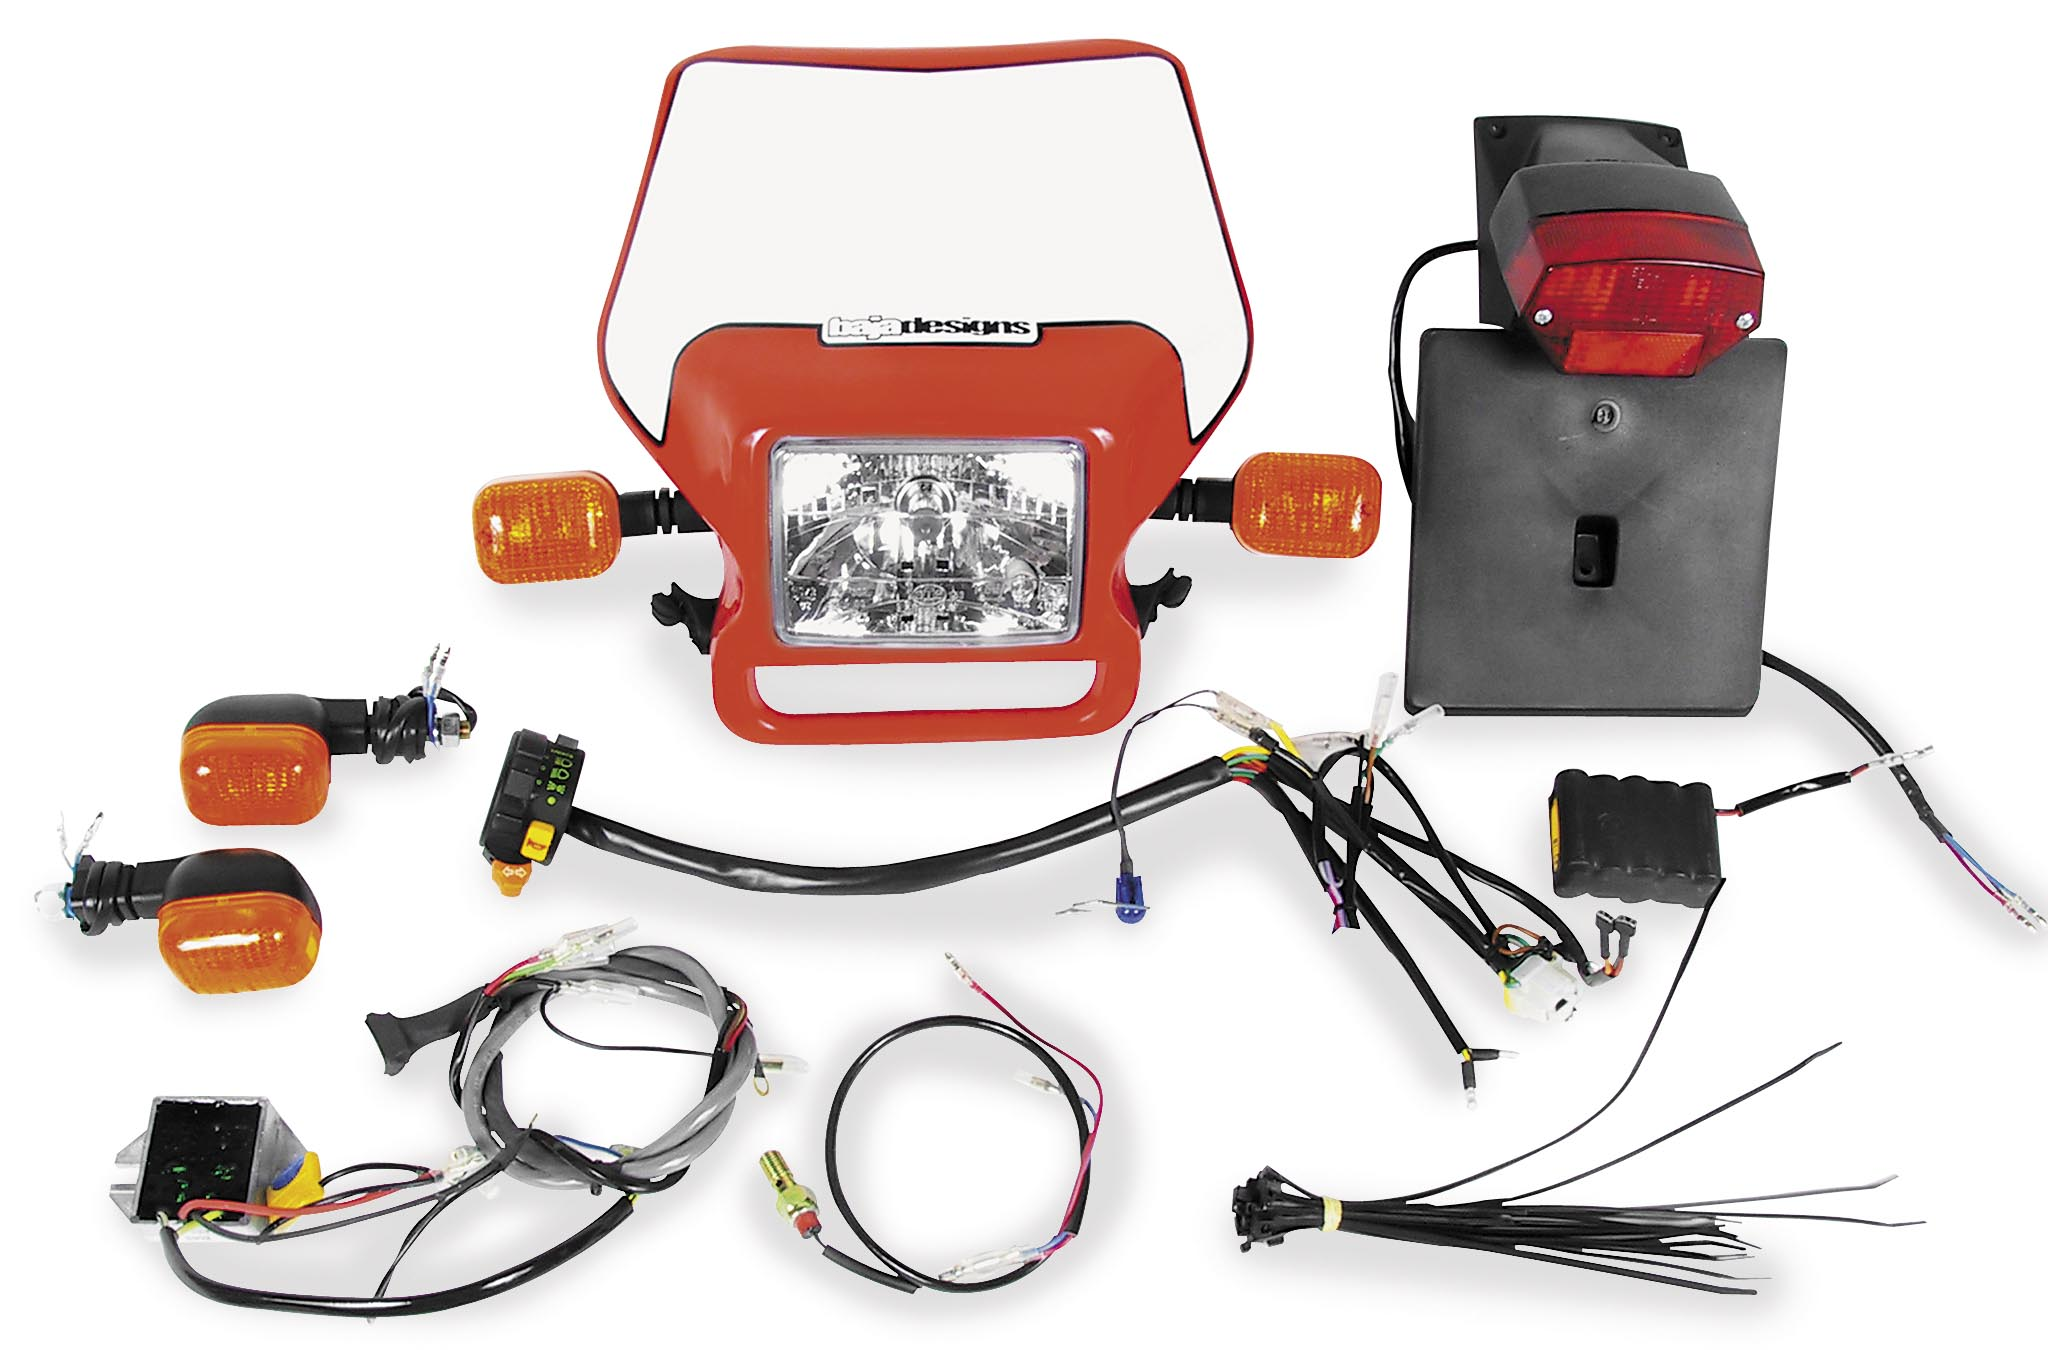 2002 xr650r wiring diagram of single phase motor dual sport harness diagrams thumbs baja designs kit ez mount red 12 1301 rd walmart com